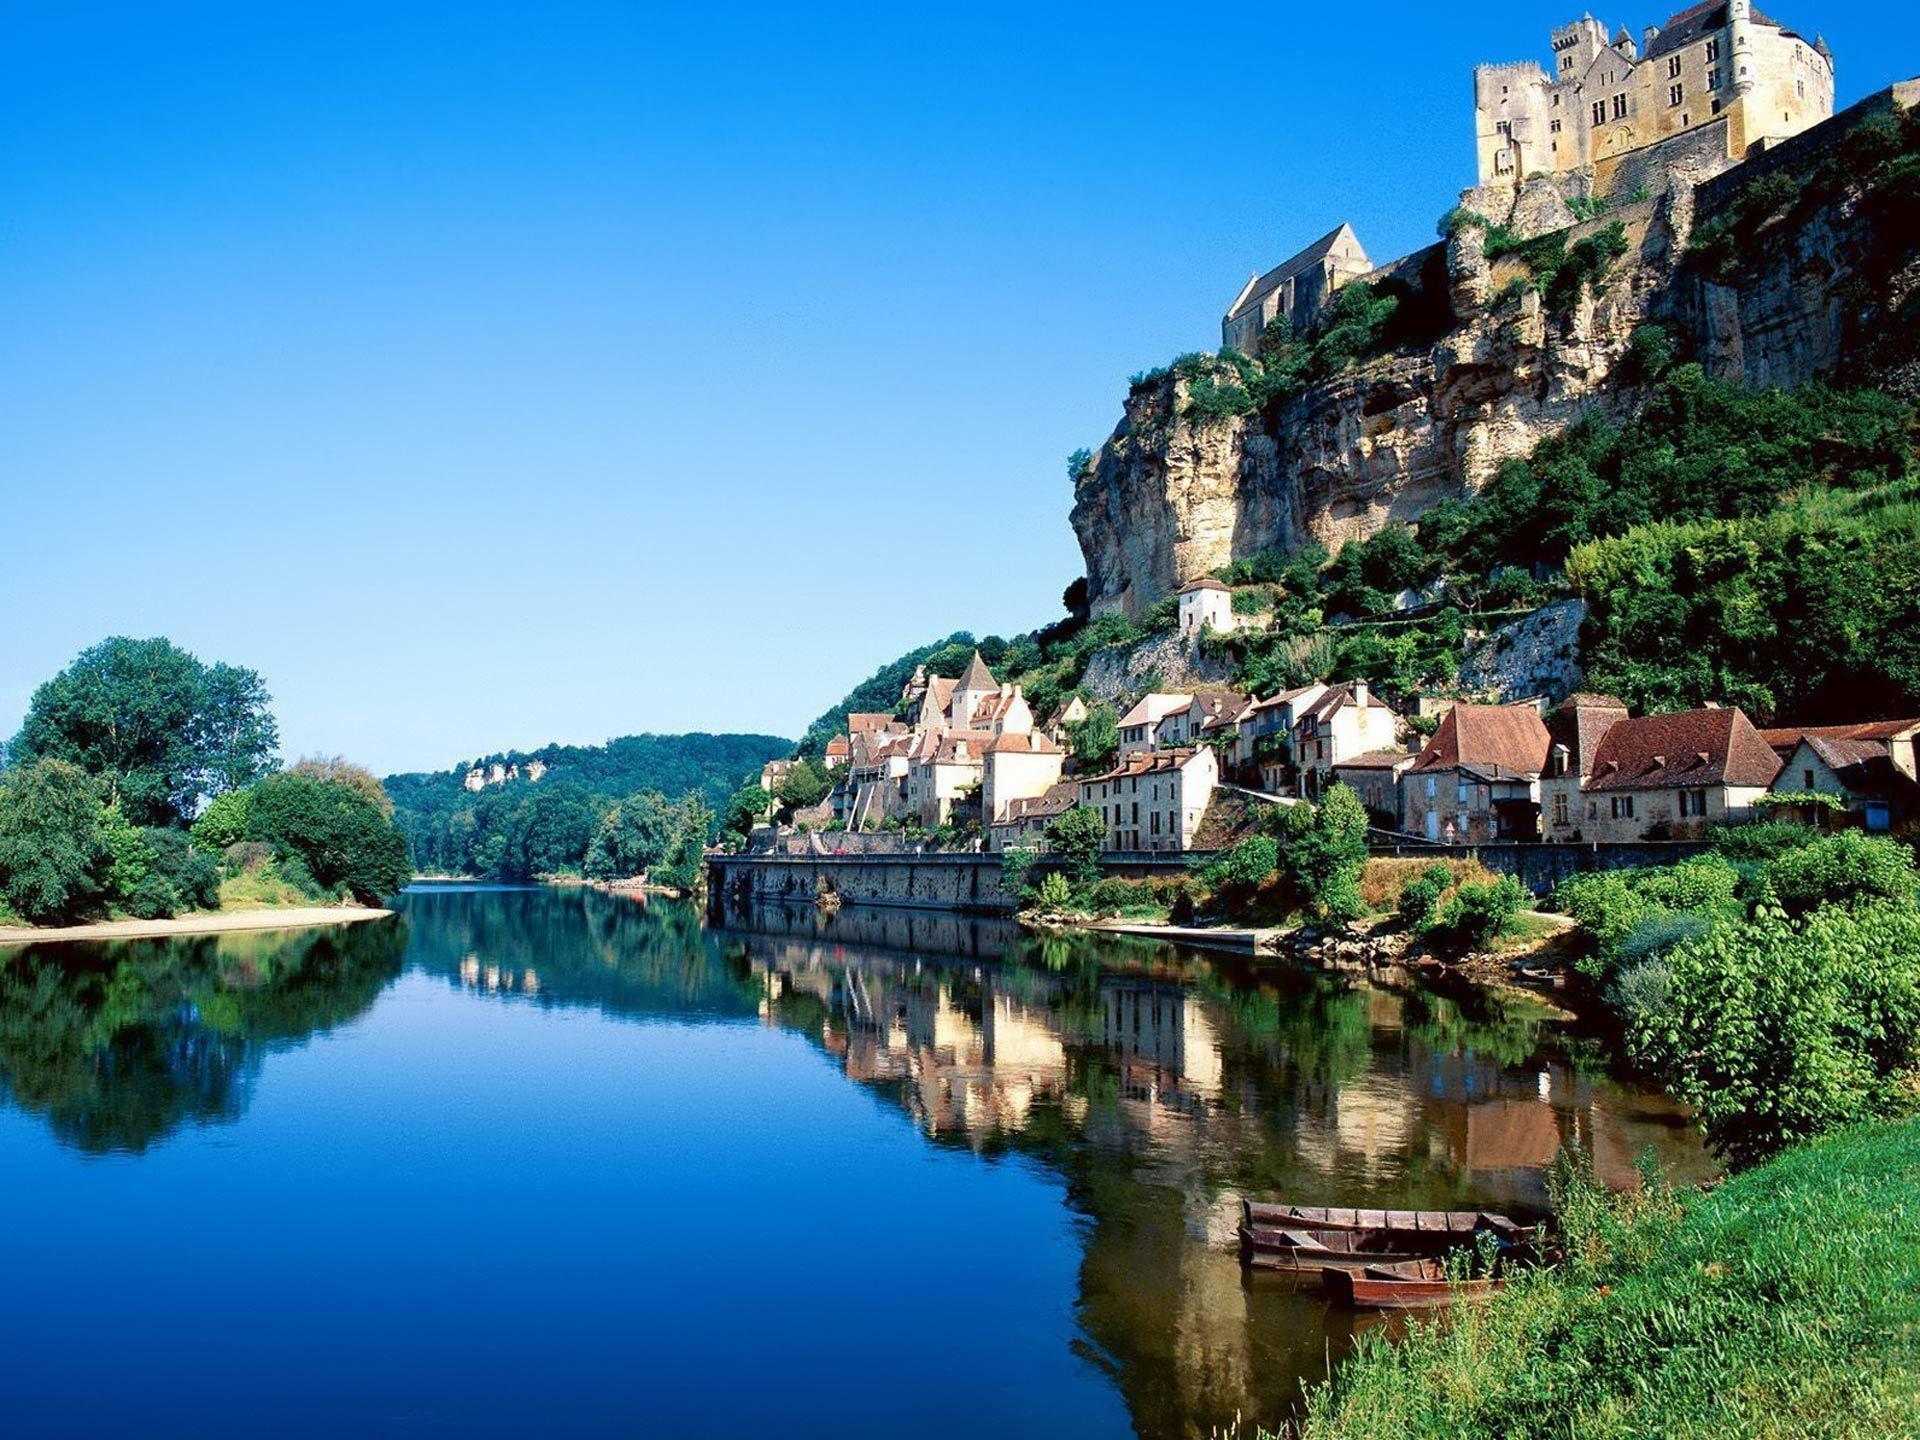 Desktop Backgrounds · Wallpaper PC · Travels   Beynac-et-Cazenac south-western France